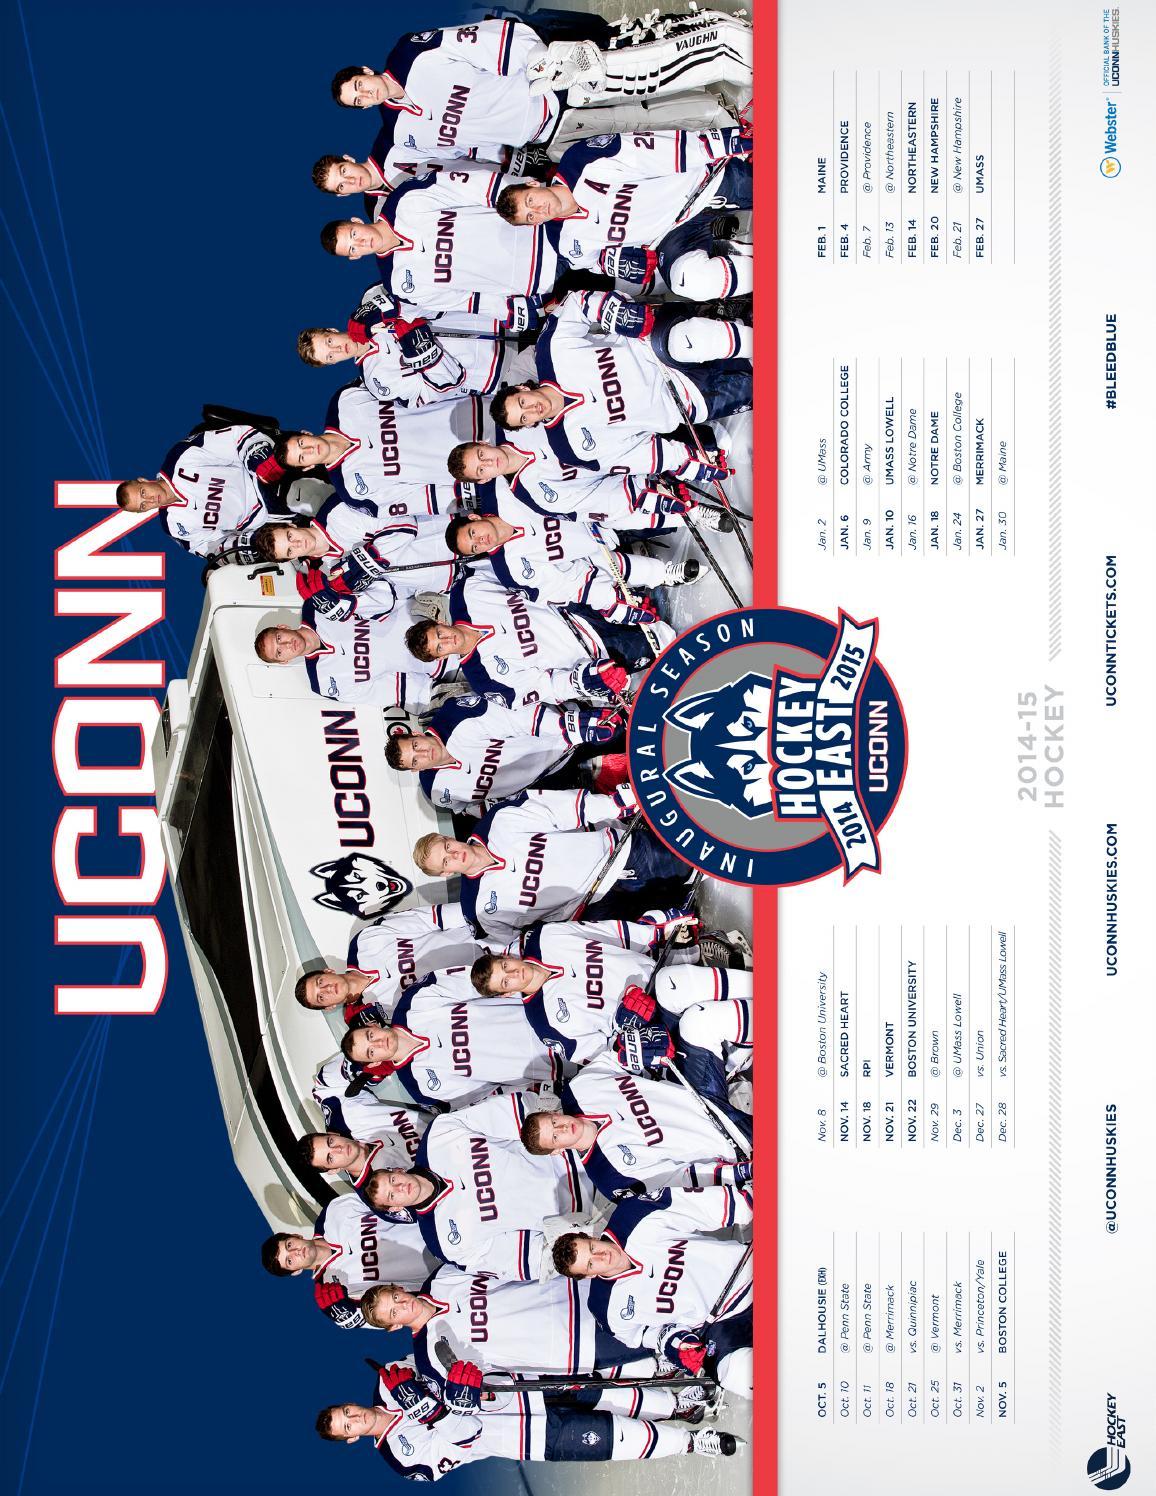 5160652ff91 2014-15 Men s Hockey Media Guide by UConn Divison of Athletics - issuu